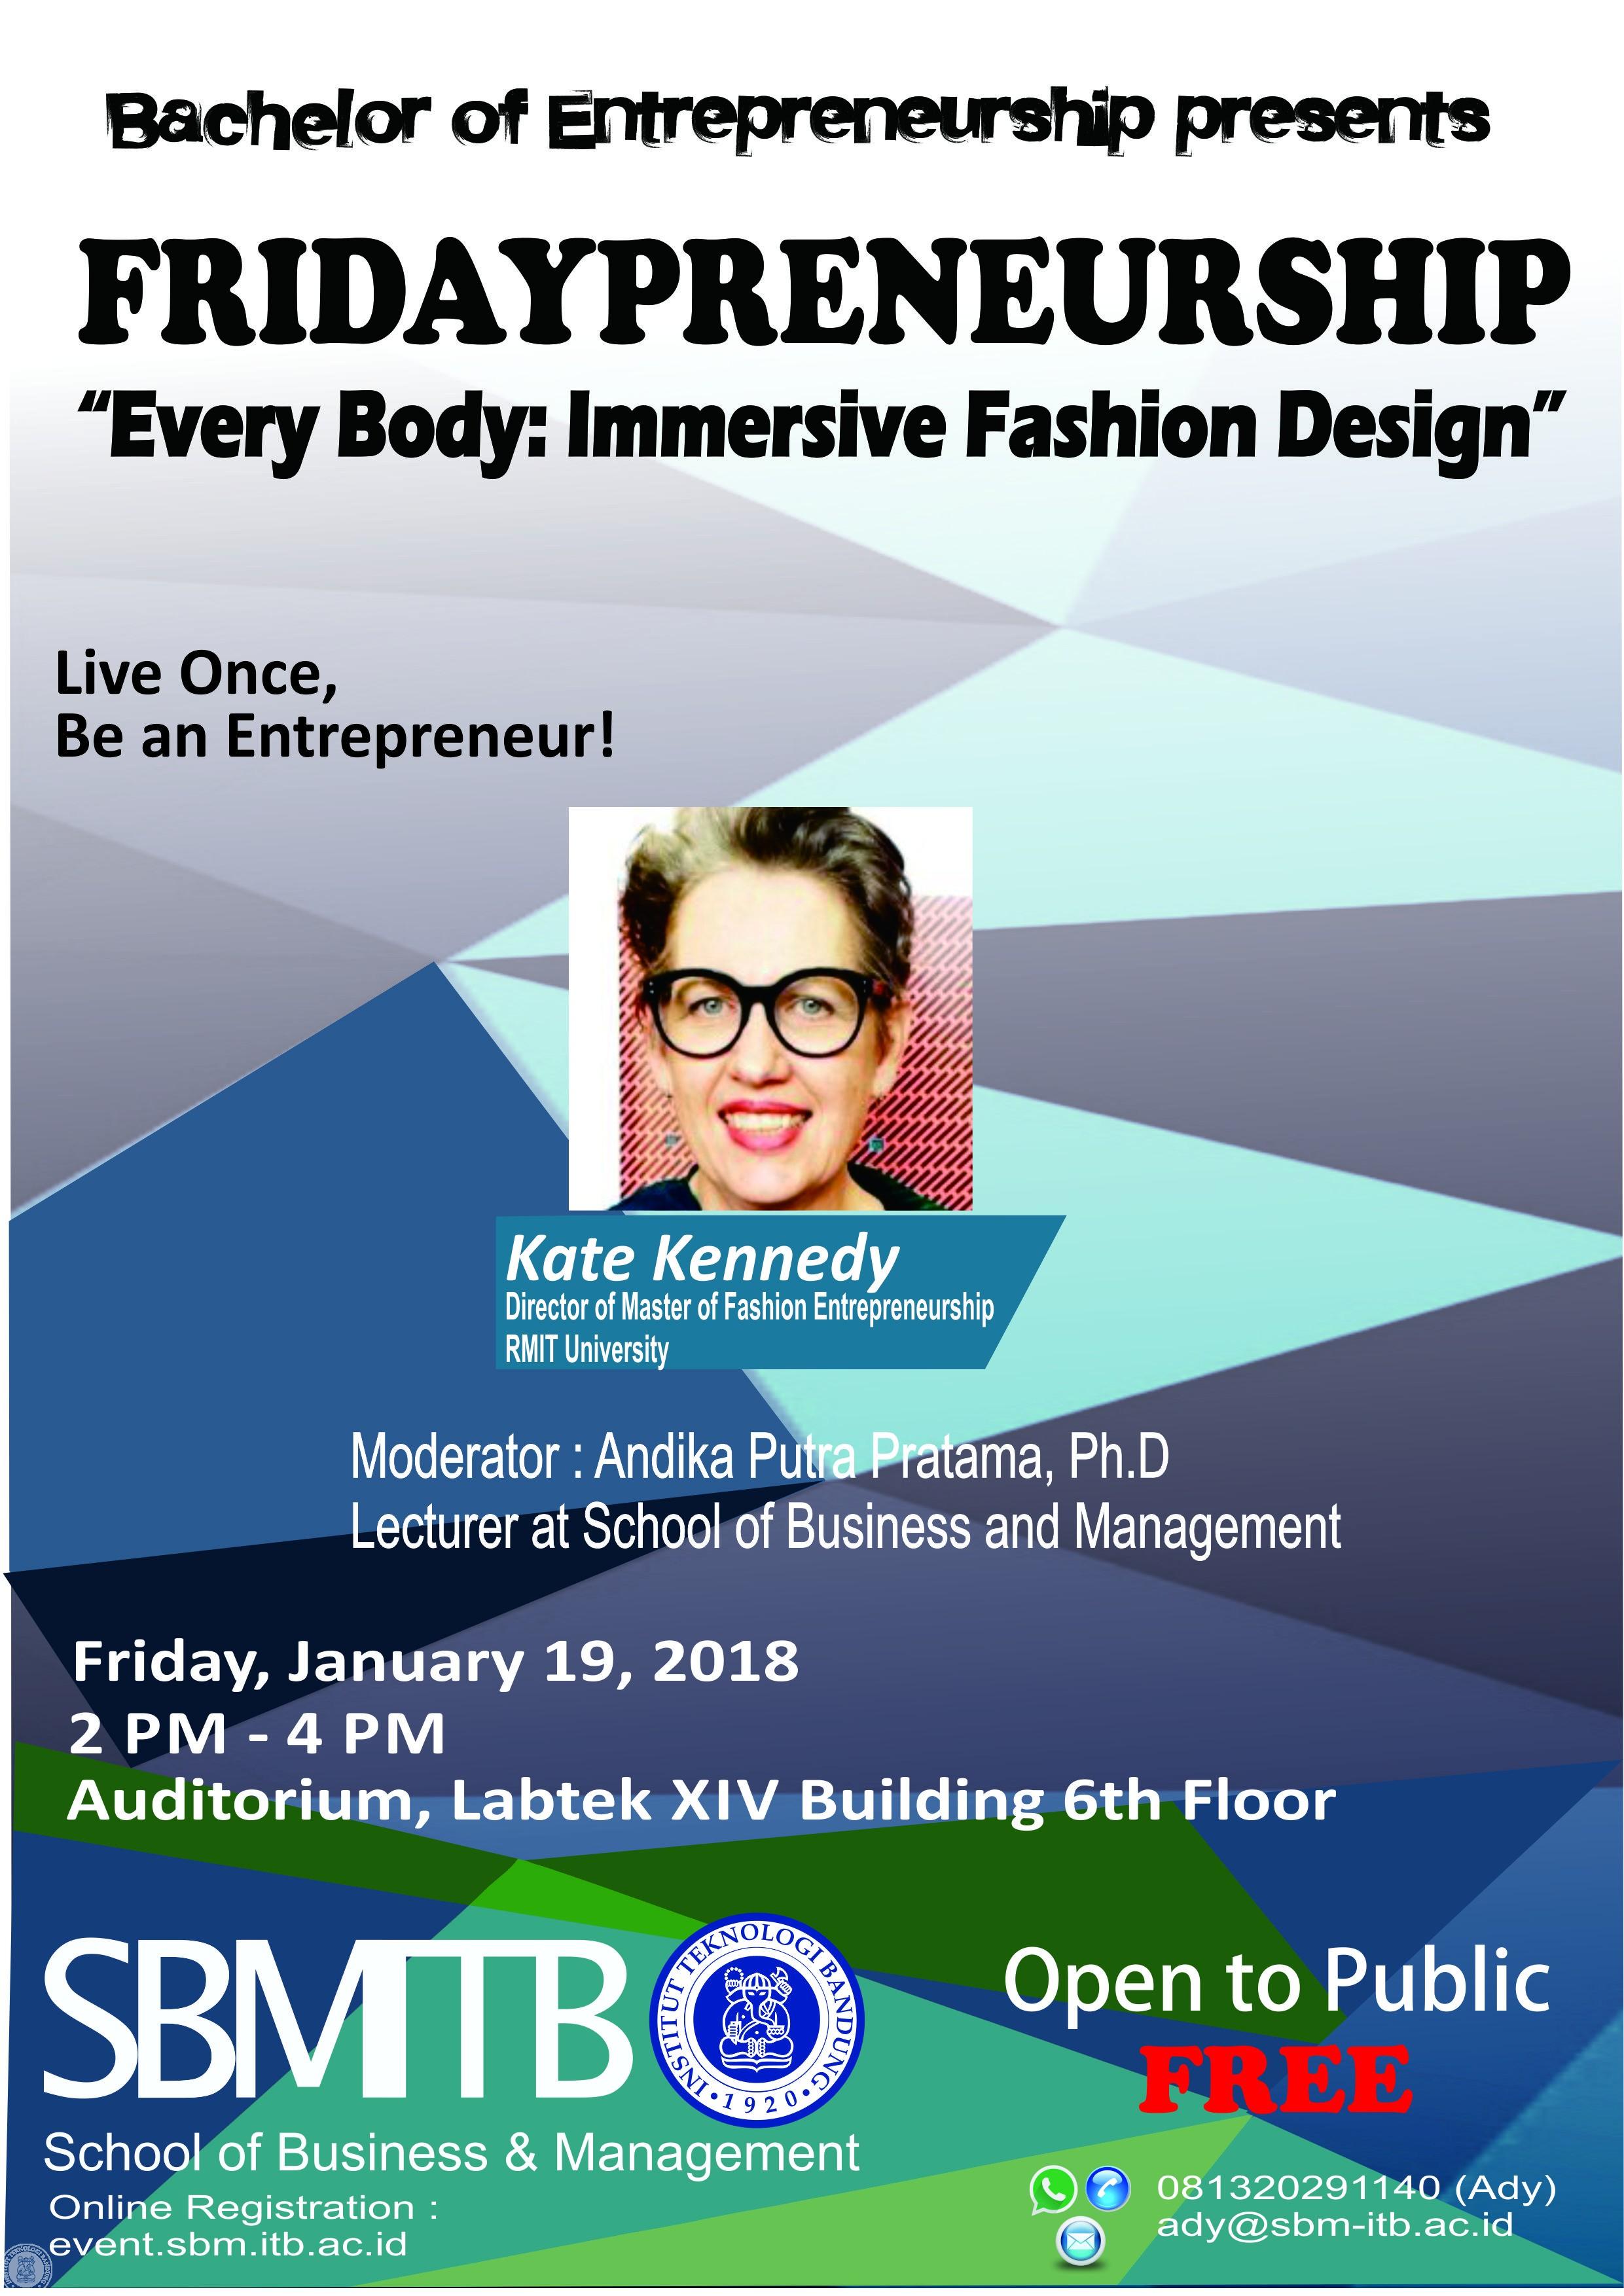 Fridaypreneurship 19 Januari 2018